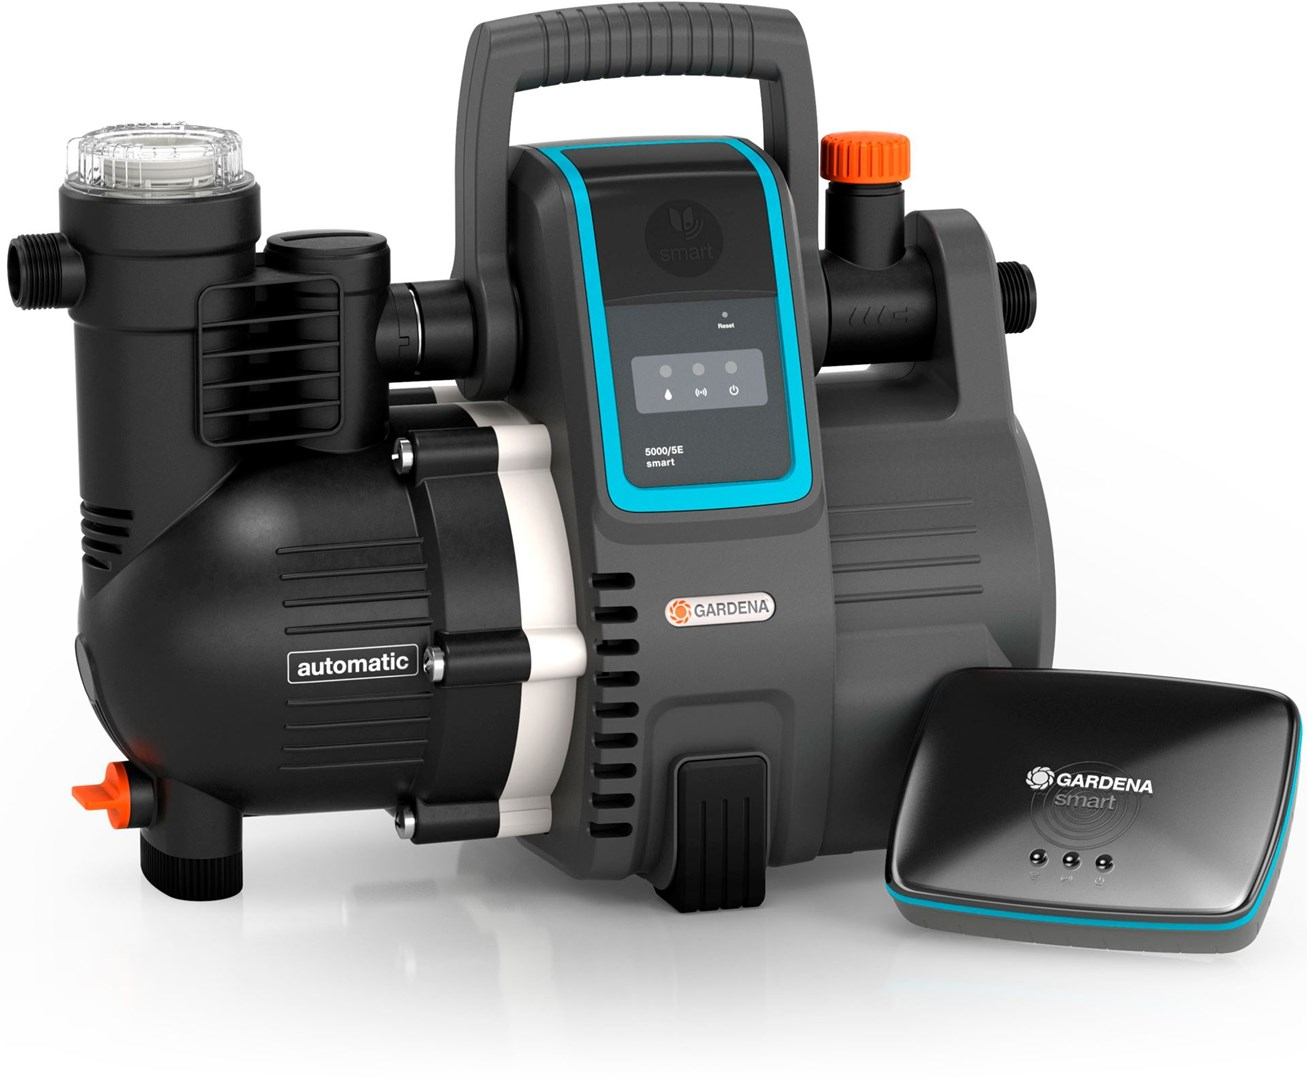 gardena smart pump inkl gateway elektrisk tryckpump och. Black Bedroom Furniture Sets. Home Design Ideas